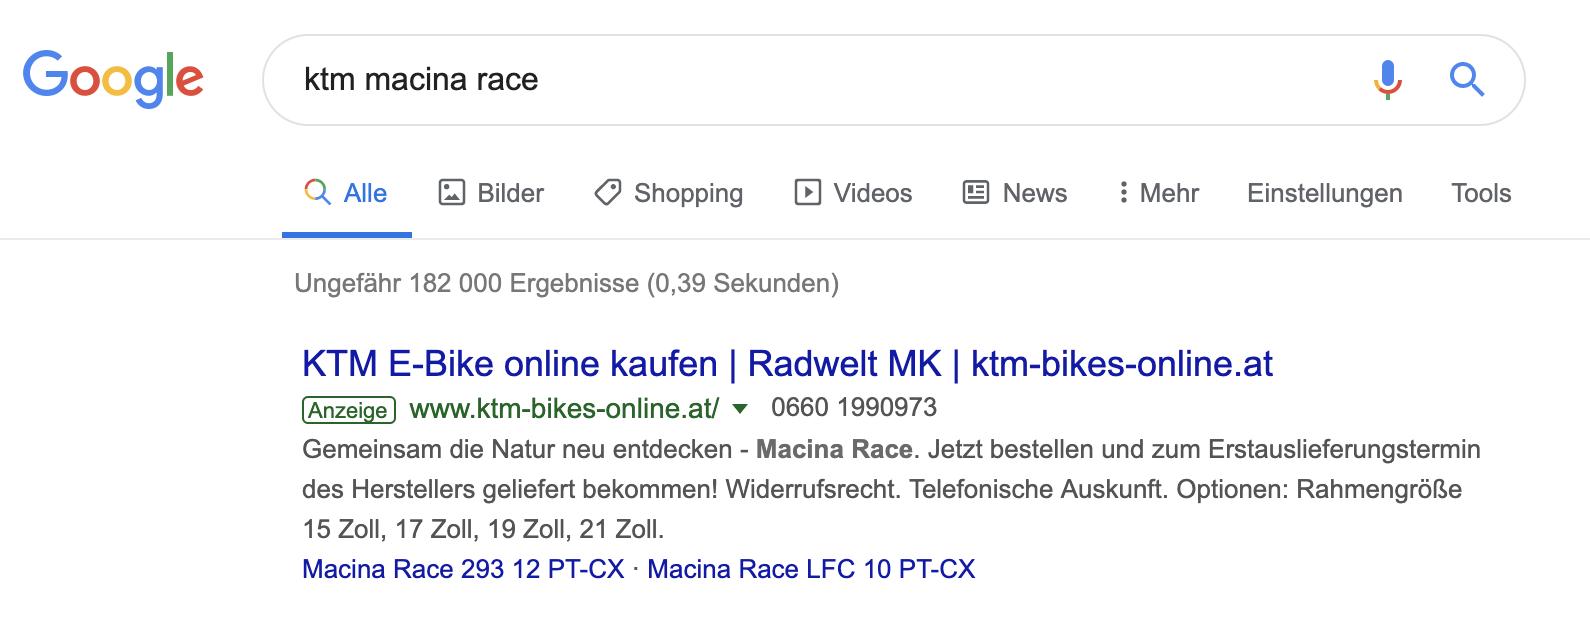 KTM Macina Race Adwords Anzeige